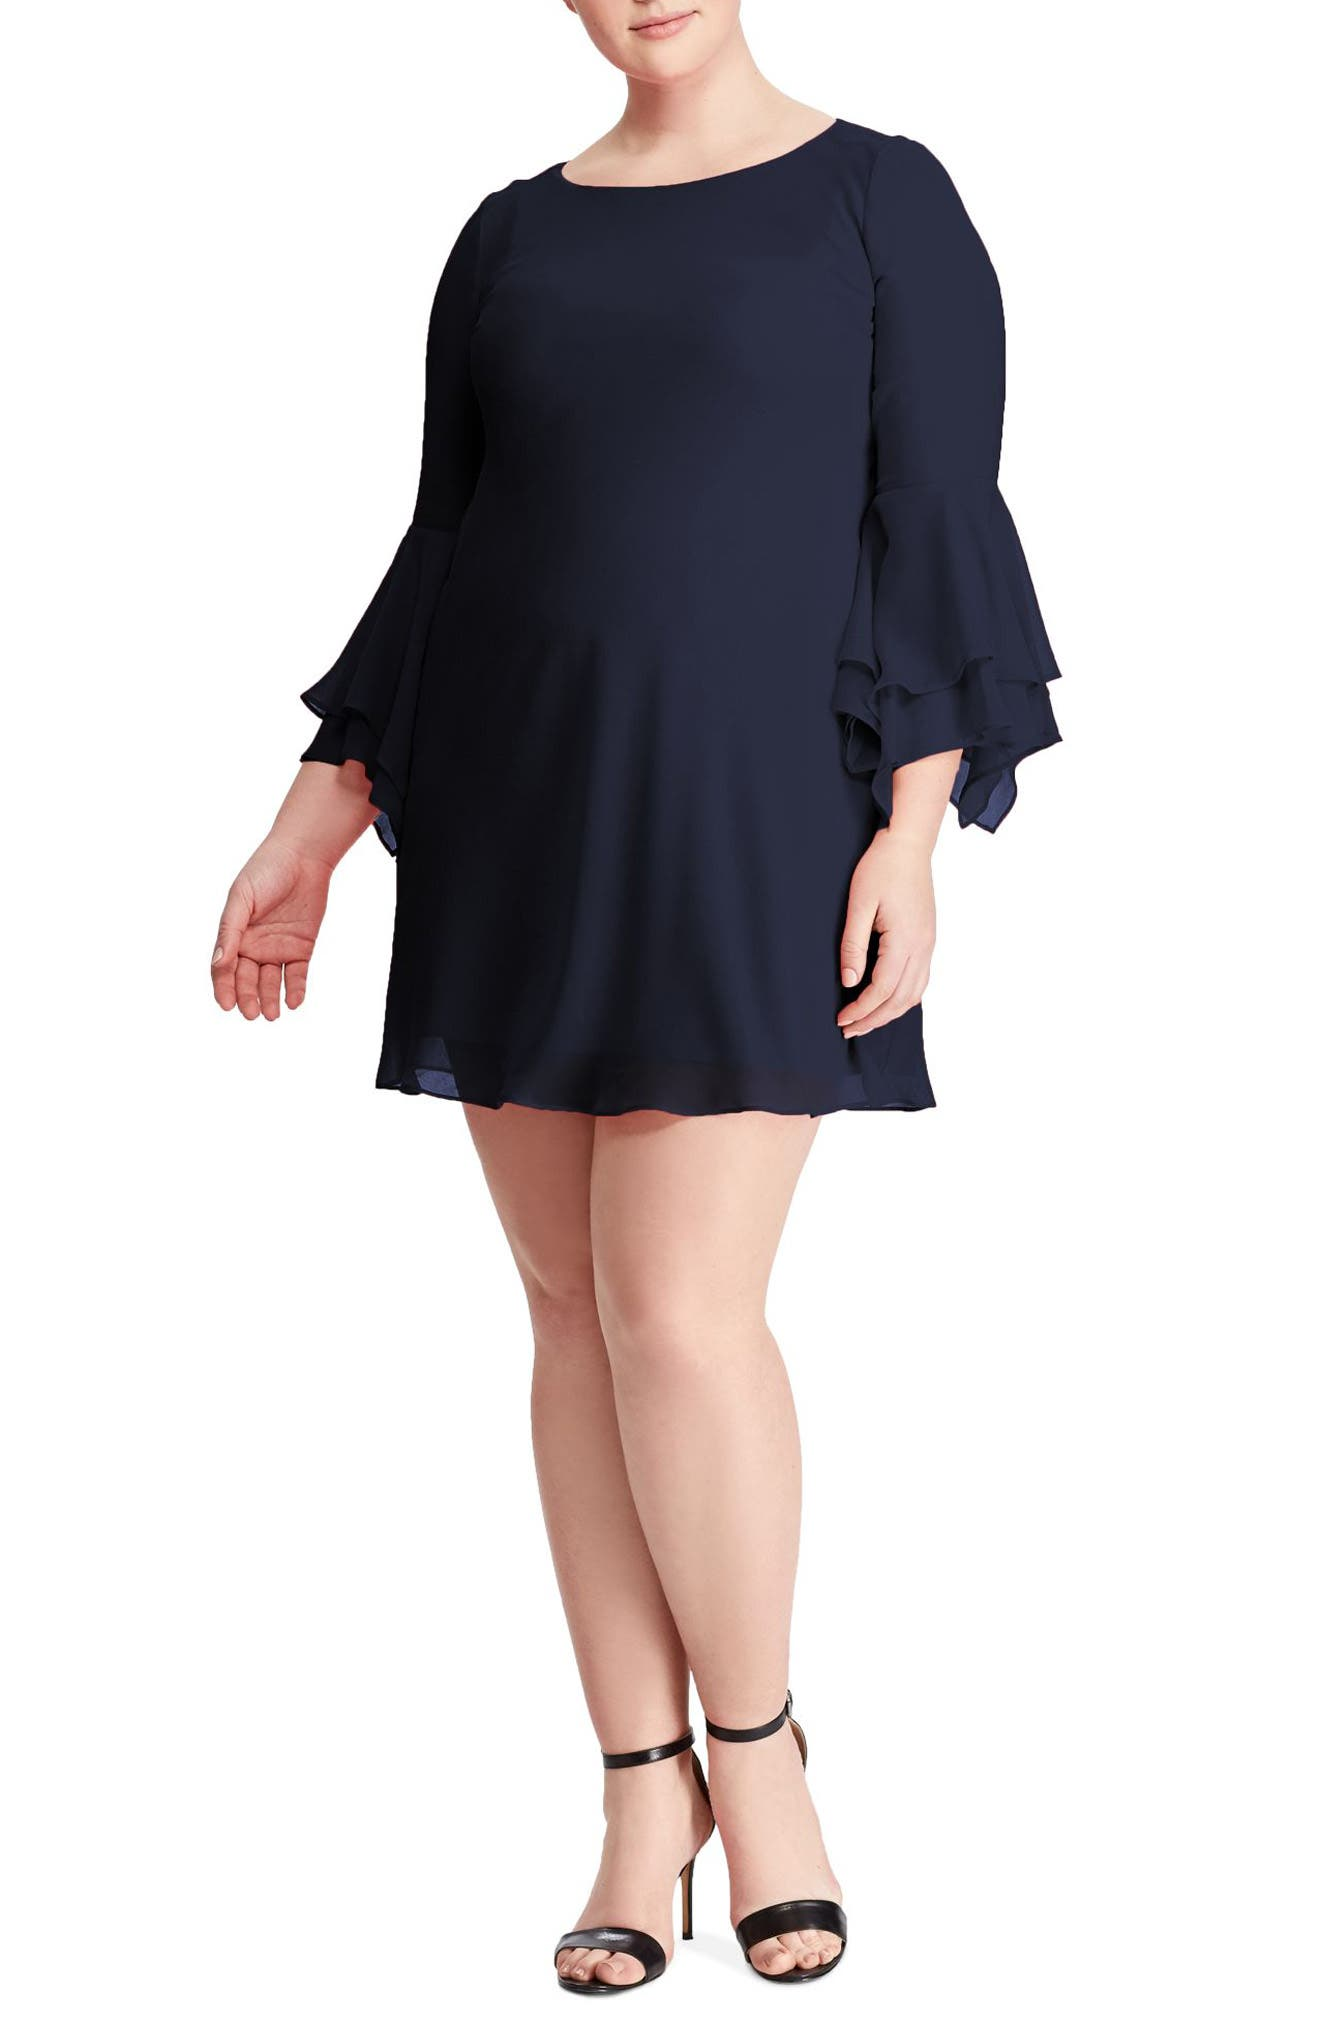 Alternate Image 1 Selected - Lauren Ralph Lauren Bell Sleeve A-Line Dress (Plus Size)